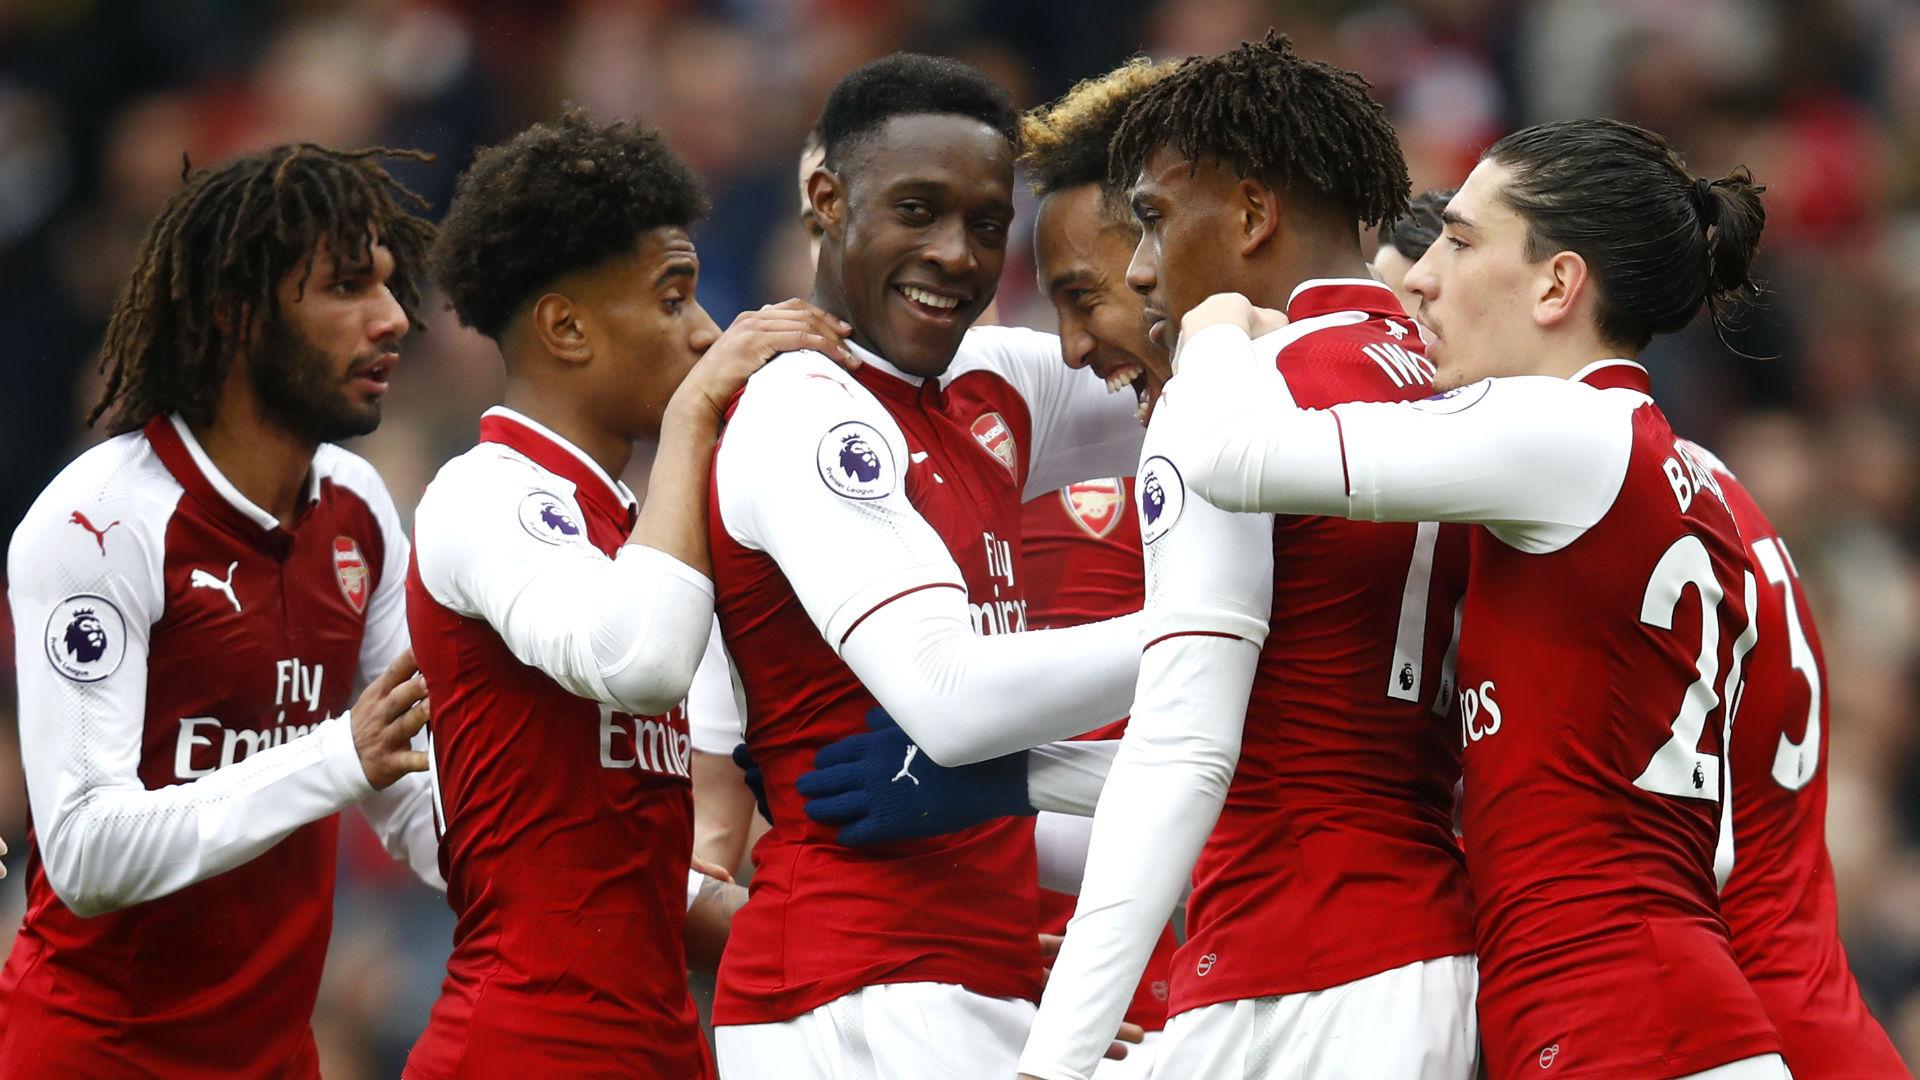 Arsenal mot wernblooms cska moskva